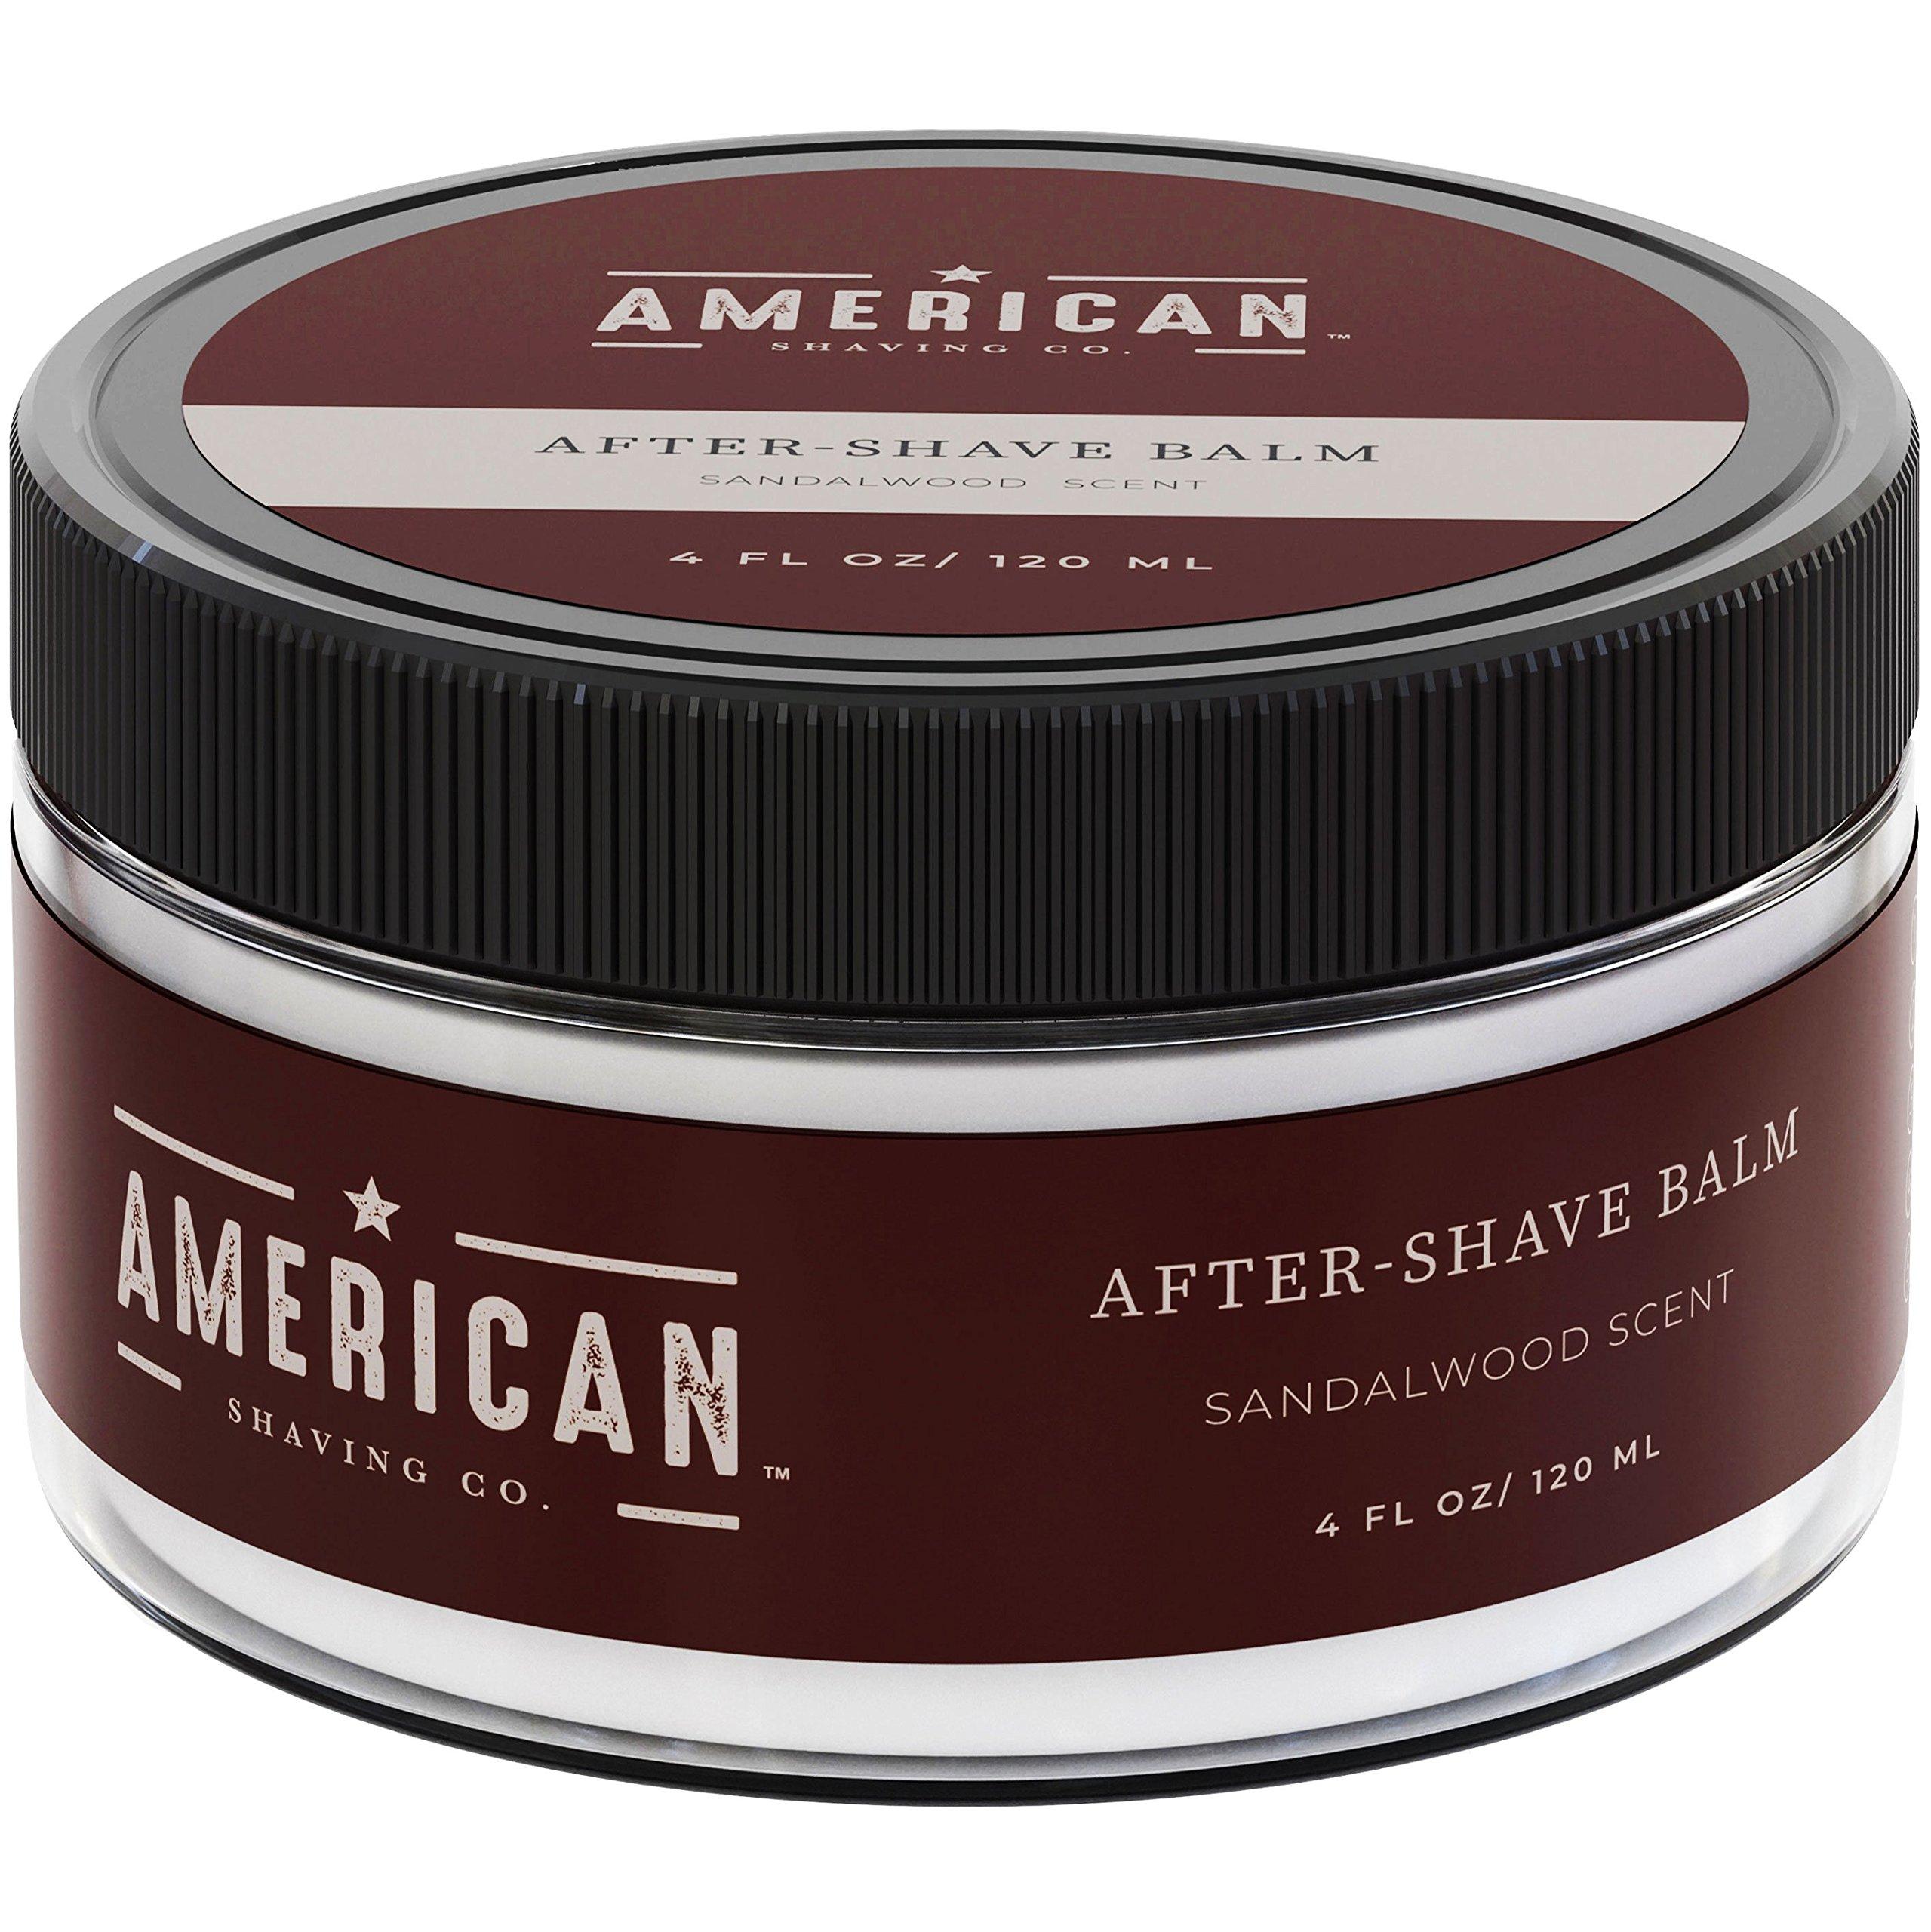 American Shaving After Shave Balm For Men (4oz) - Sandalwood Barbershop Scent - 100% Natural Moisturizing Aftershave Lotion - Best Aftershave For Men to Soothe Dry Sensitive Skin (Packaging May Vary)